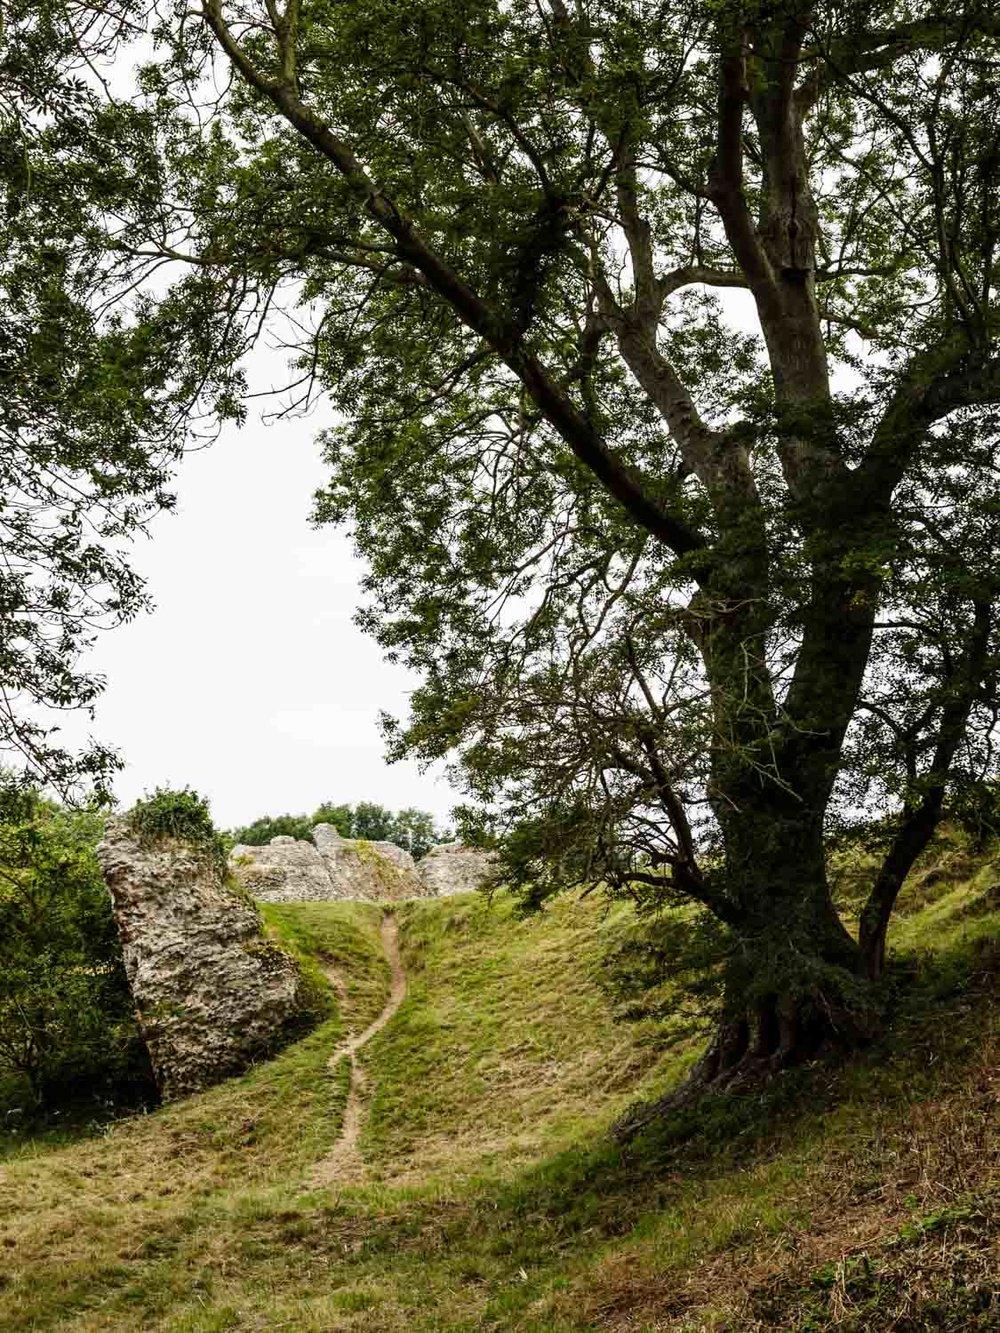 english-heritage-pevensey-castle-grounds-andrew-maybury.jpg